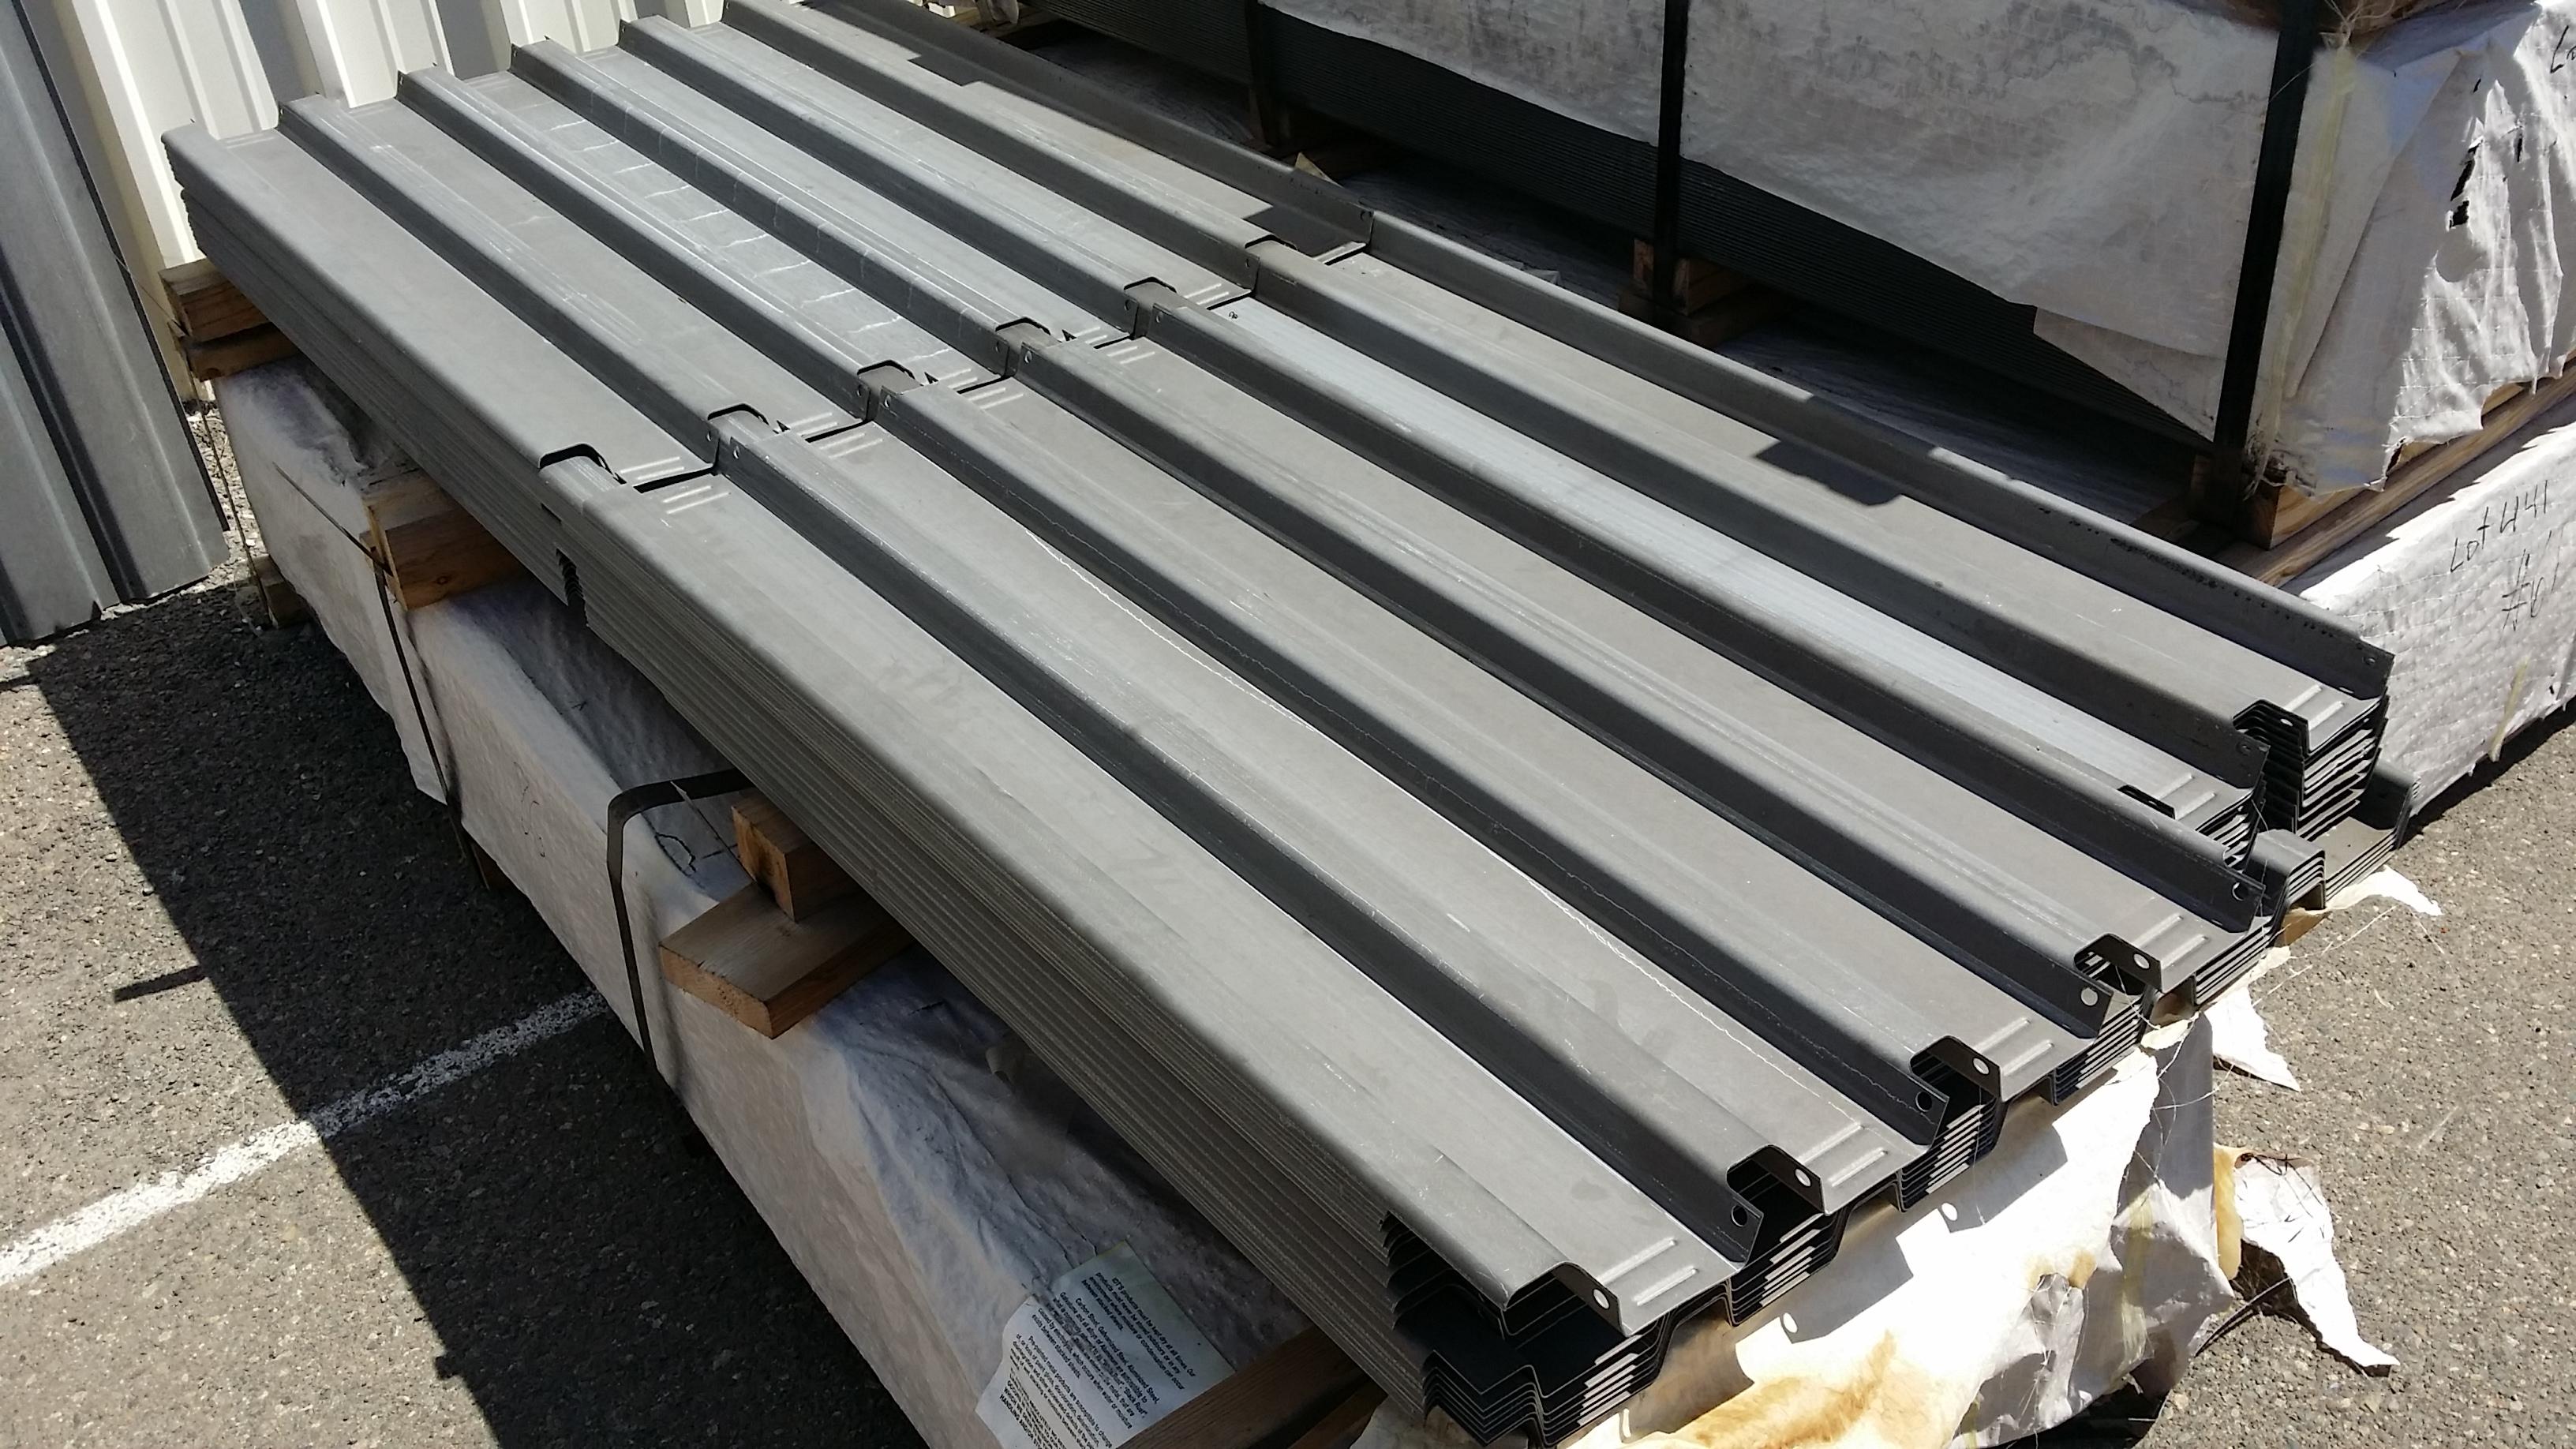 Metal Barrier Border Fencing Fencing B Deck Roofing Sheets